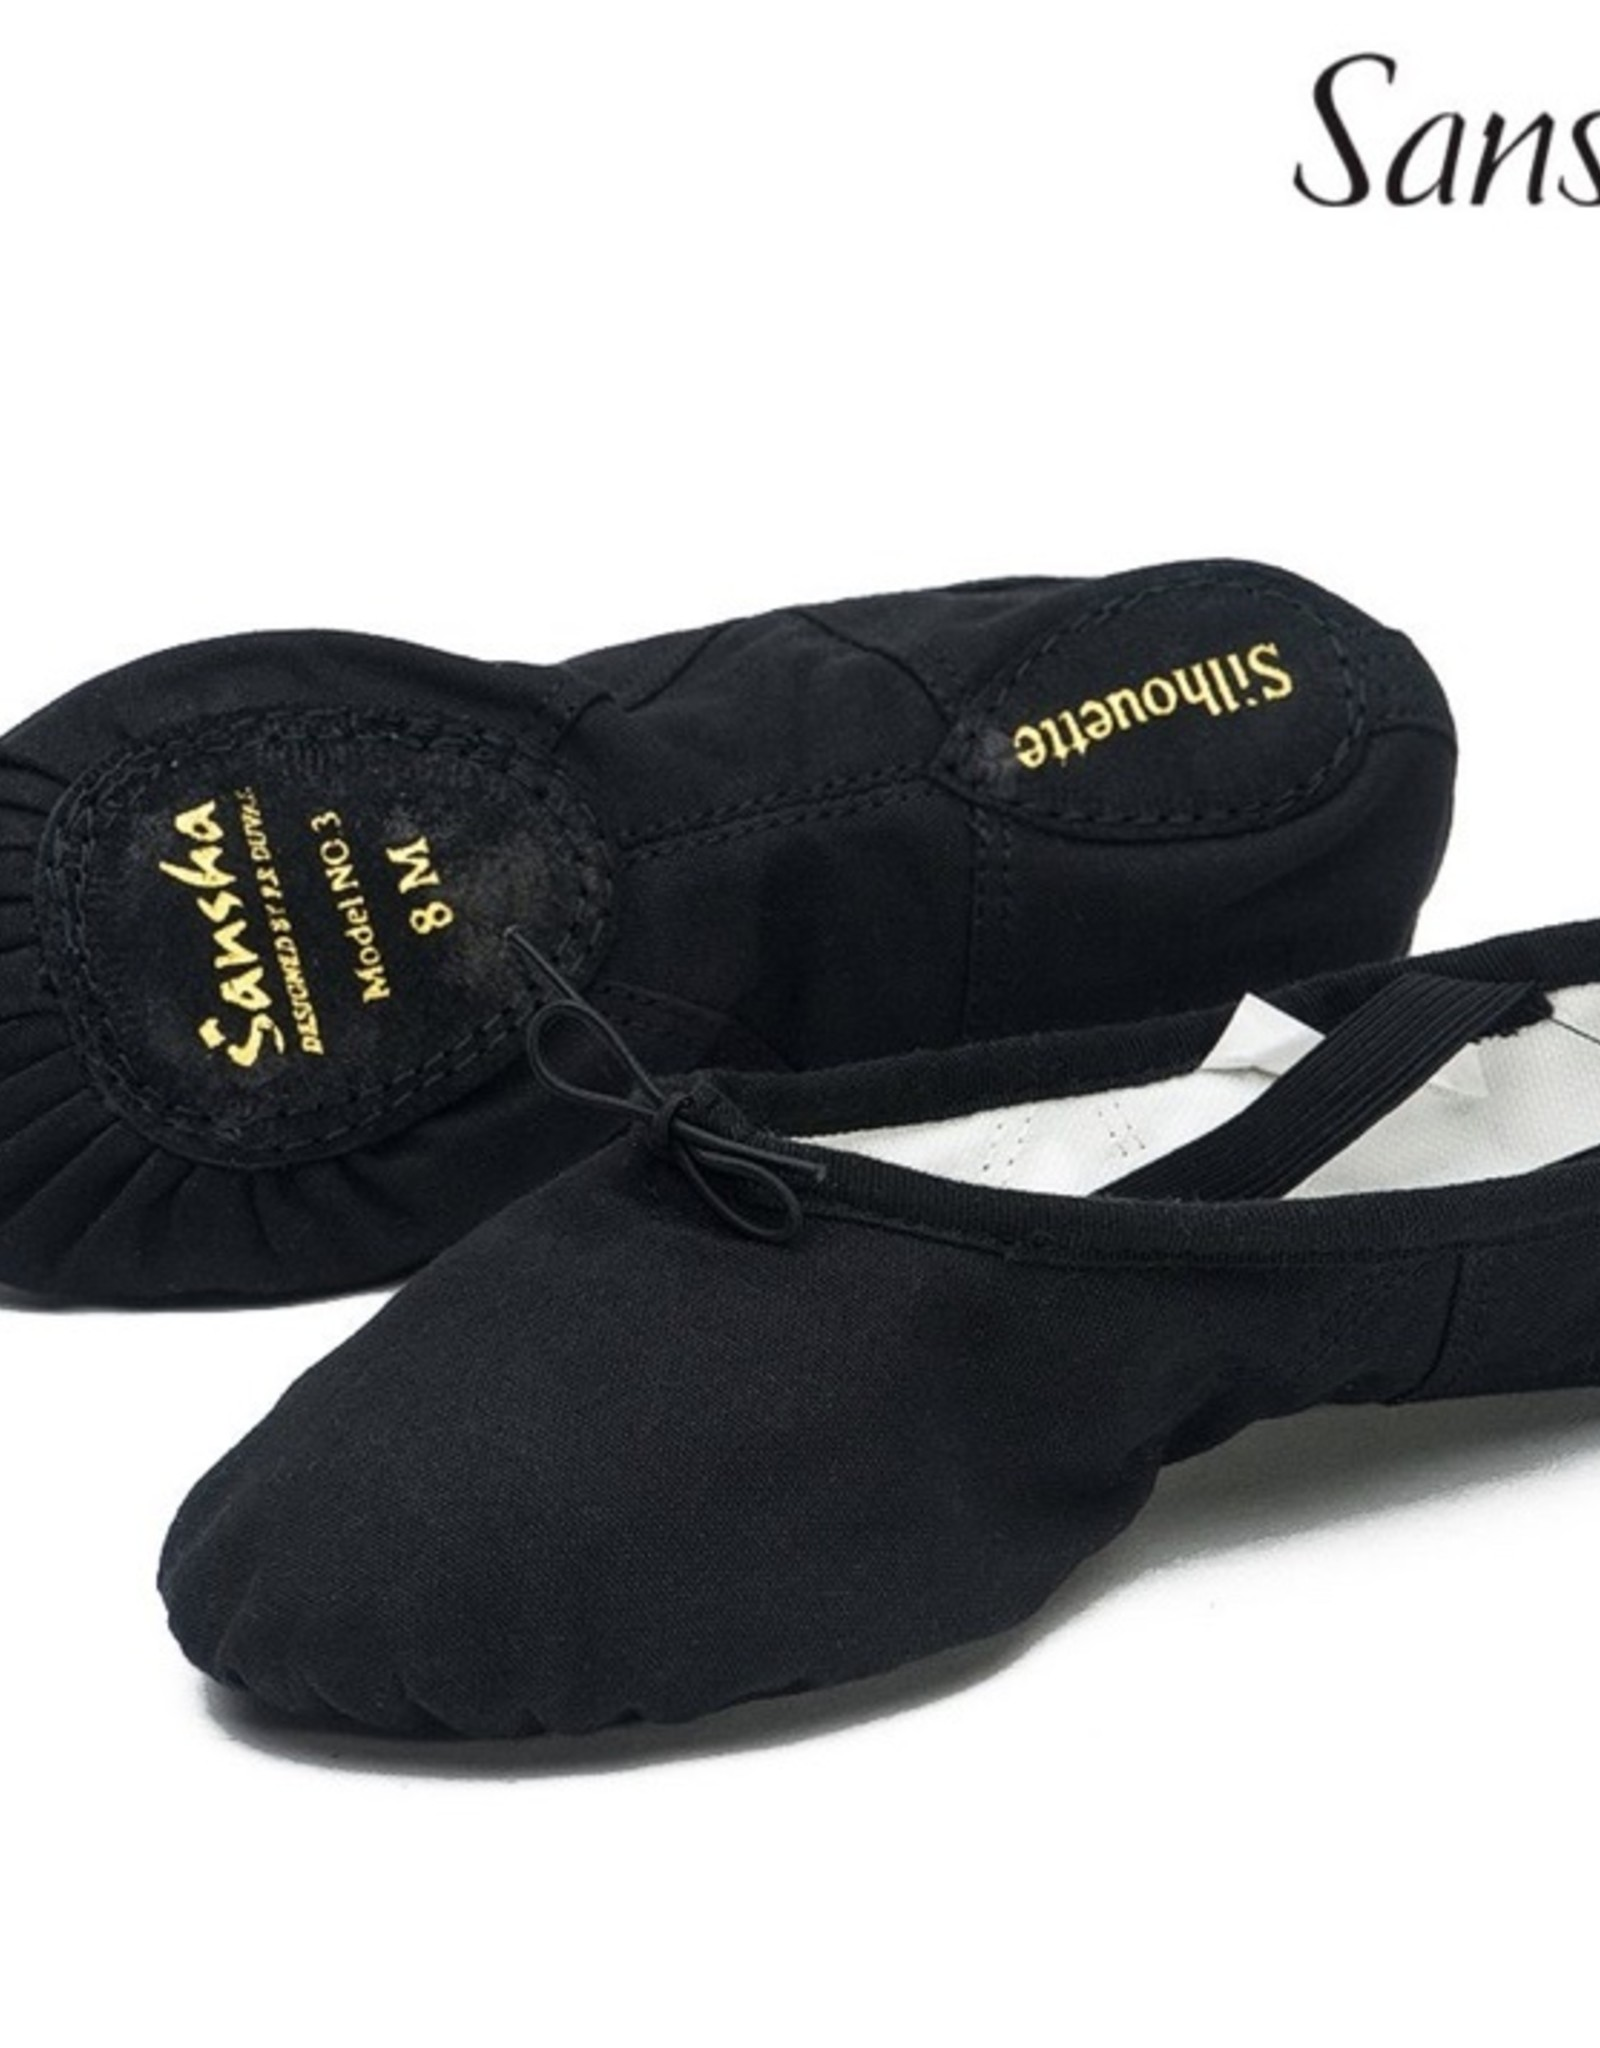 Sansha Zwarte balletsloefjes Sansha Silhouette